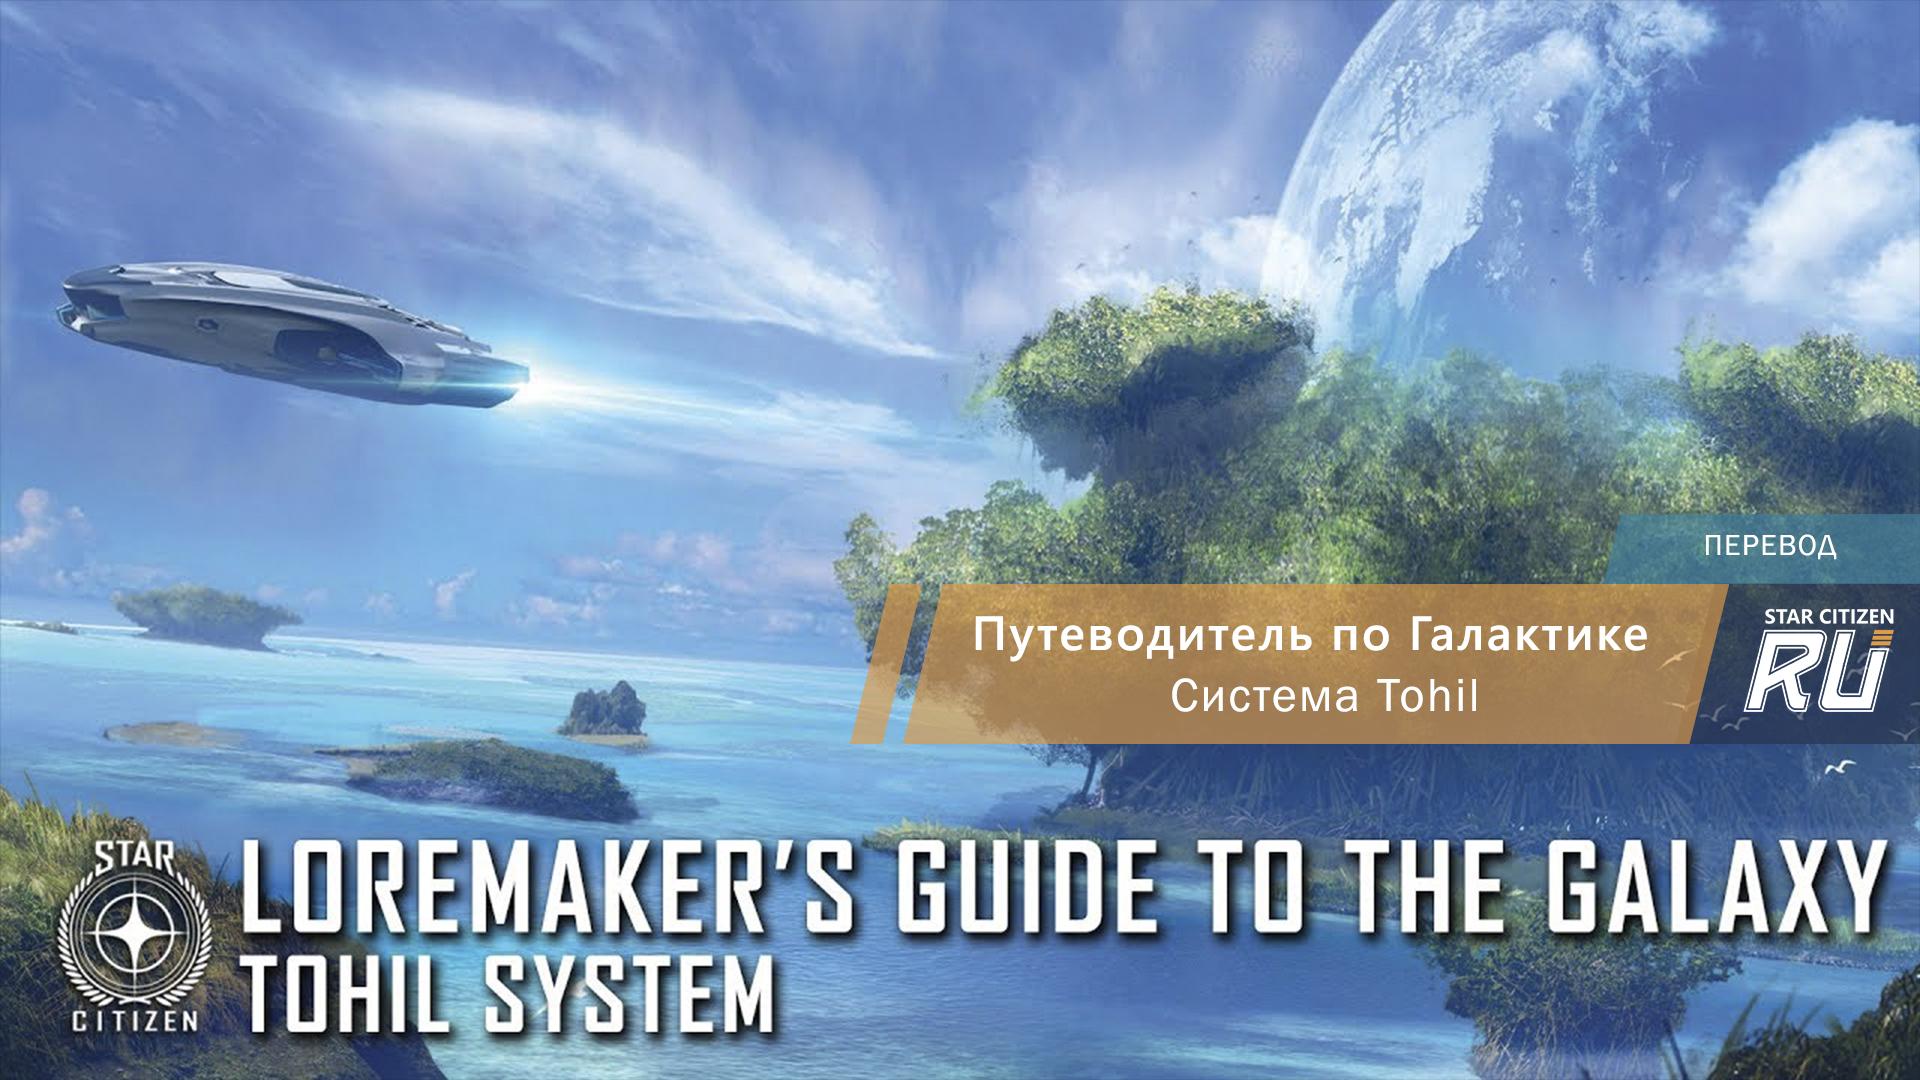 Путеводитель по Галактике: система Tohil